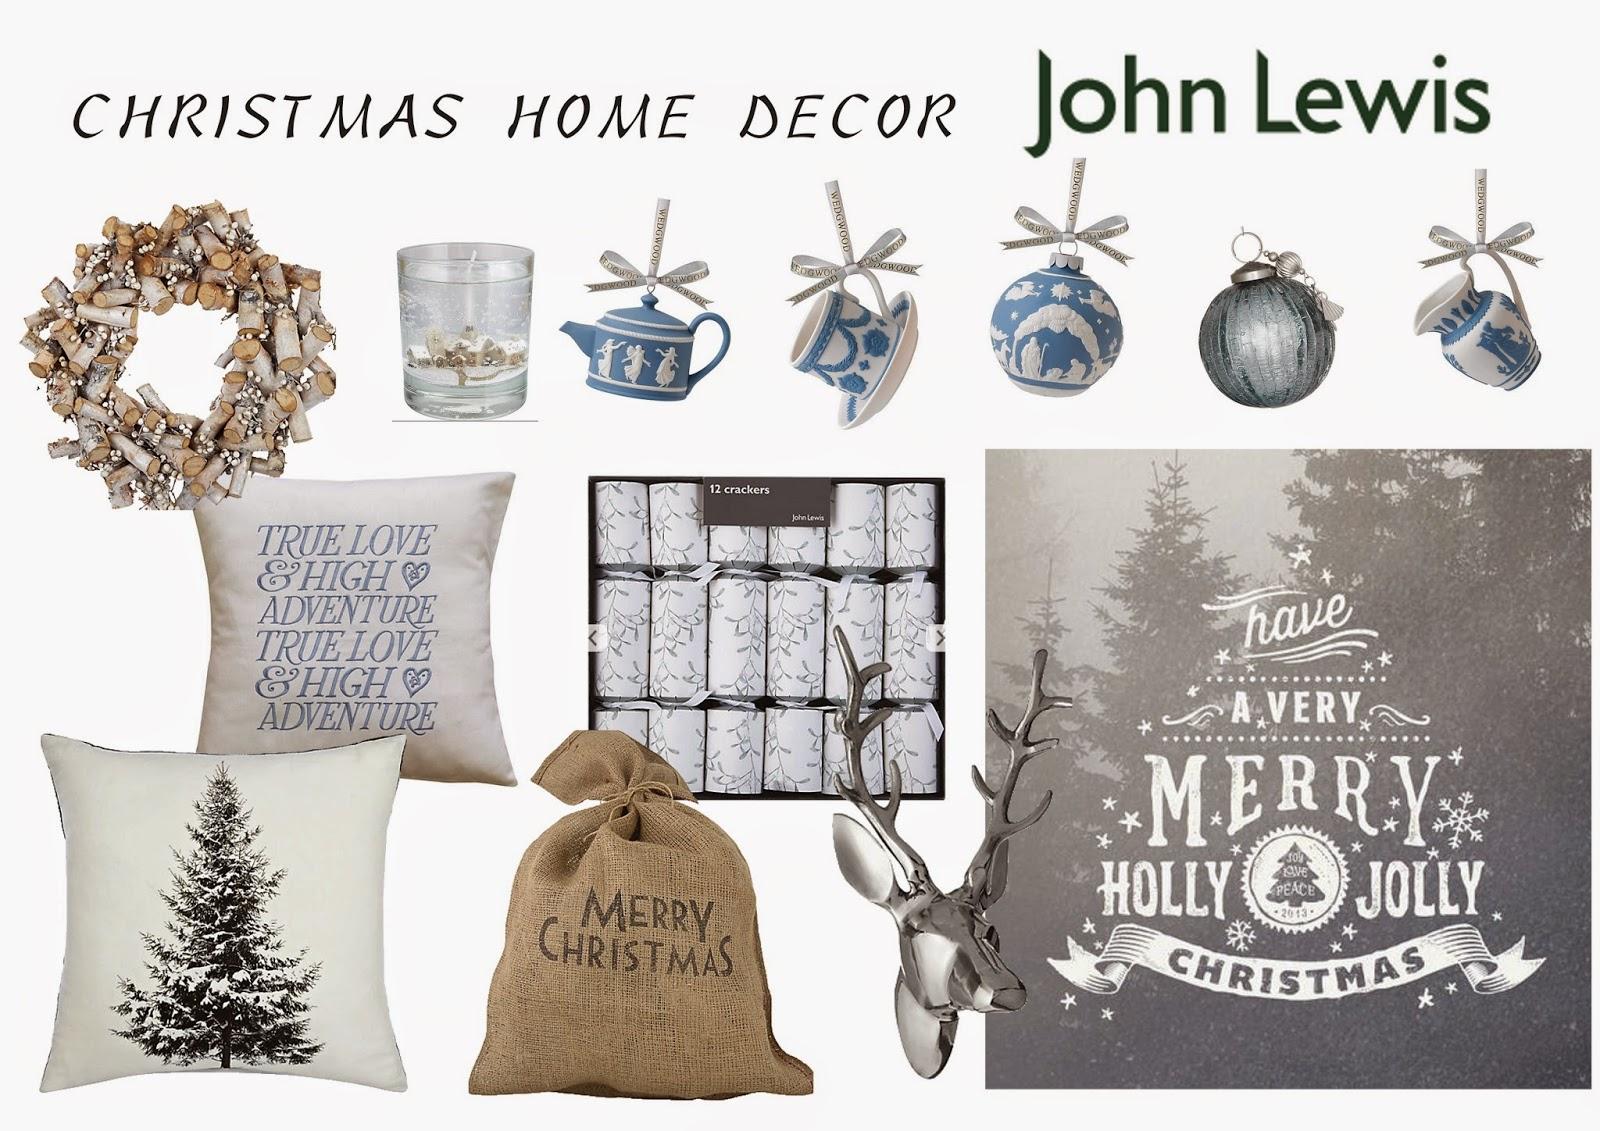 BLUE AND WHITE CHRISTMAS HOME DECOR FT. JOHN LEWIS